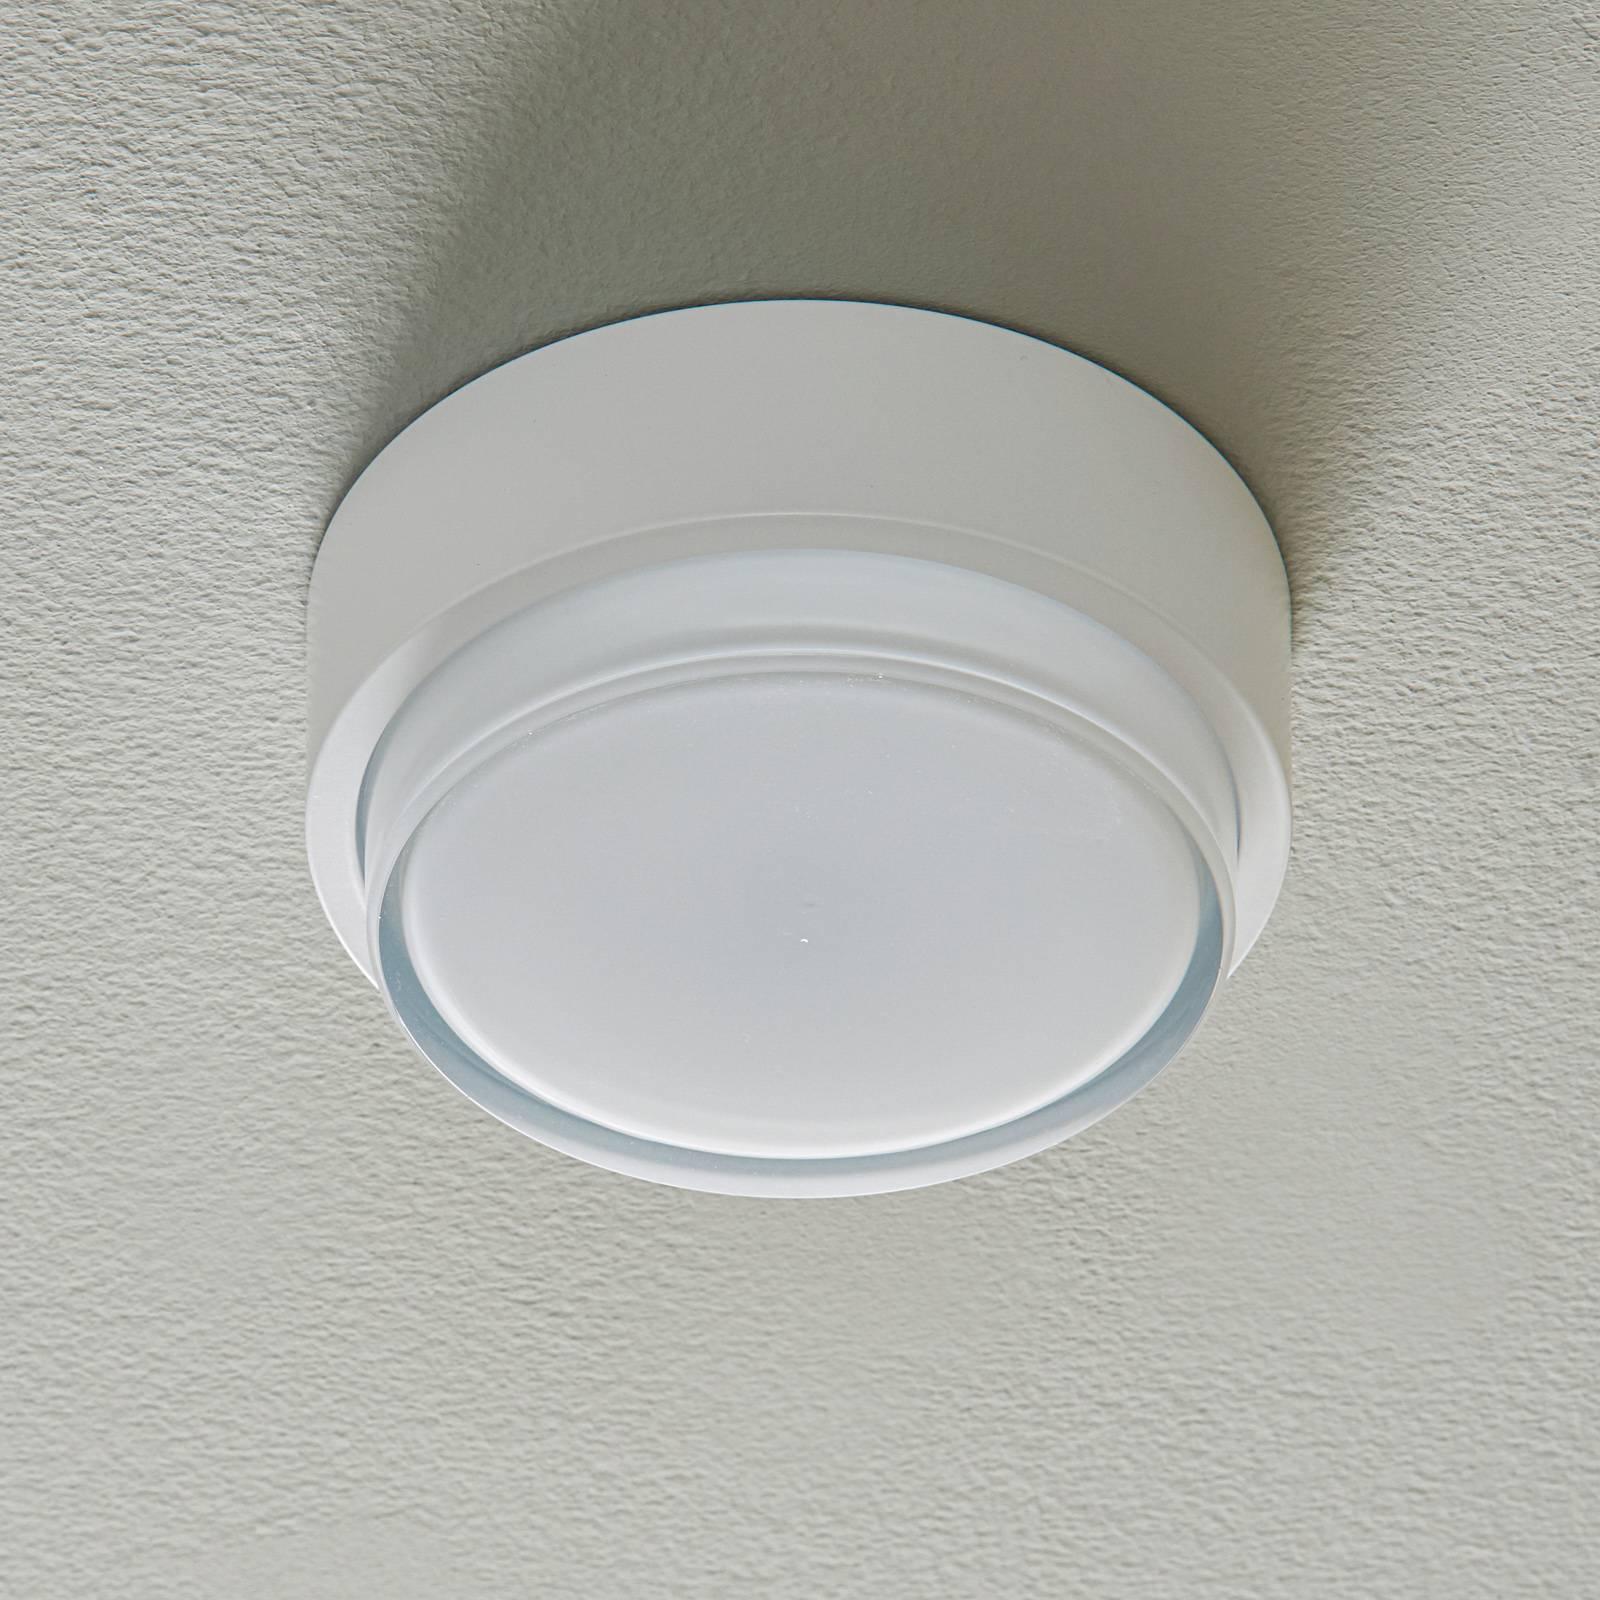 BEGA 50535 LED-kattovalaisin 930 valkoinen Ø15,5cm